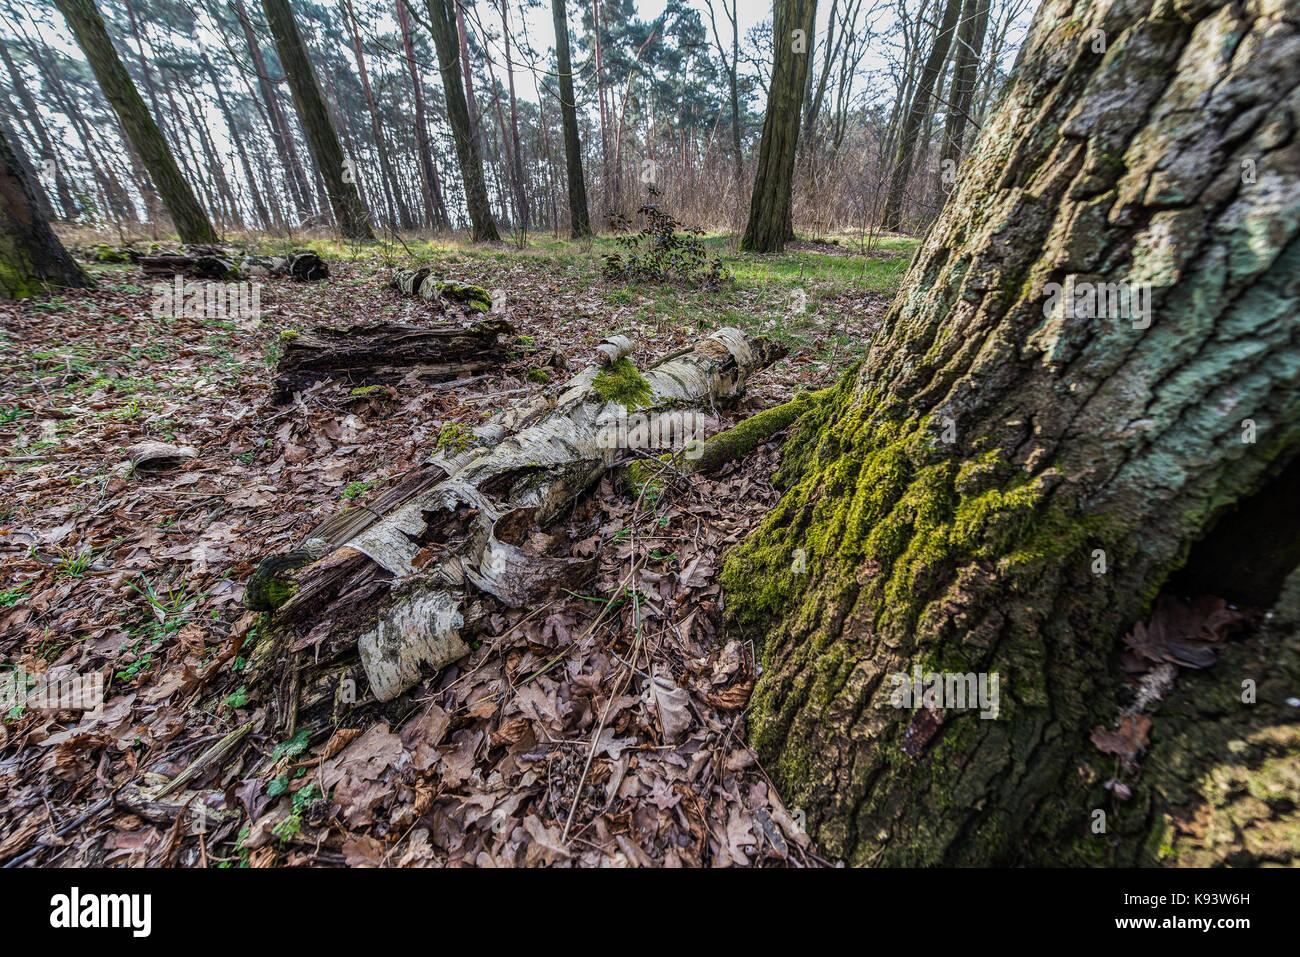 forest near Scharmützelsee, Brandenburg, Germany - Stock Image